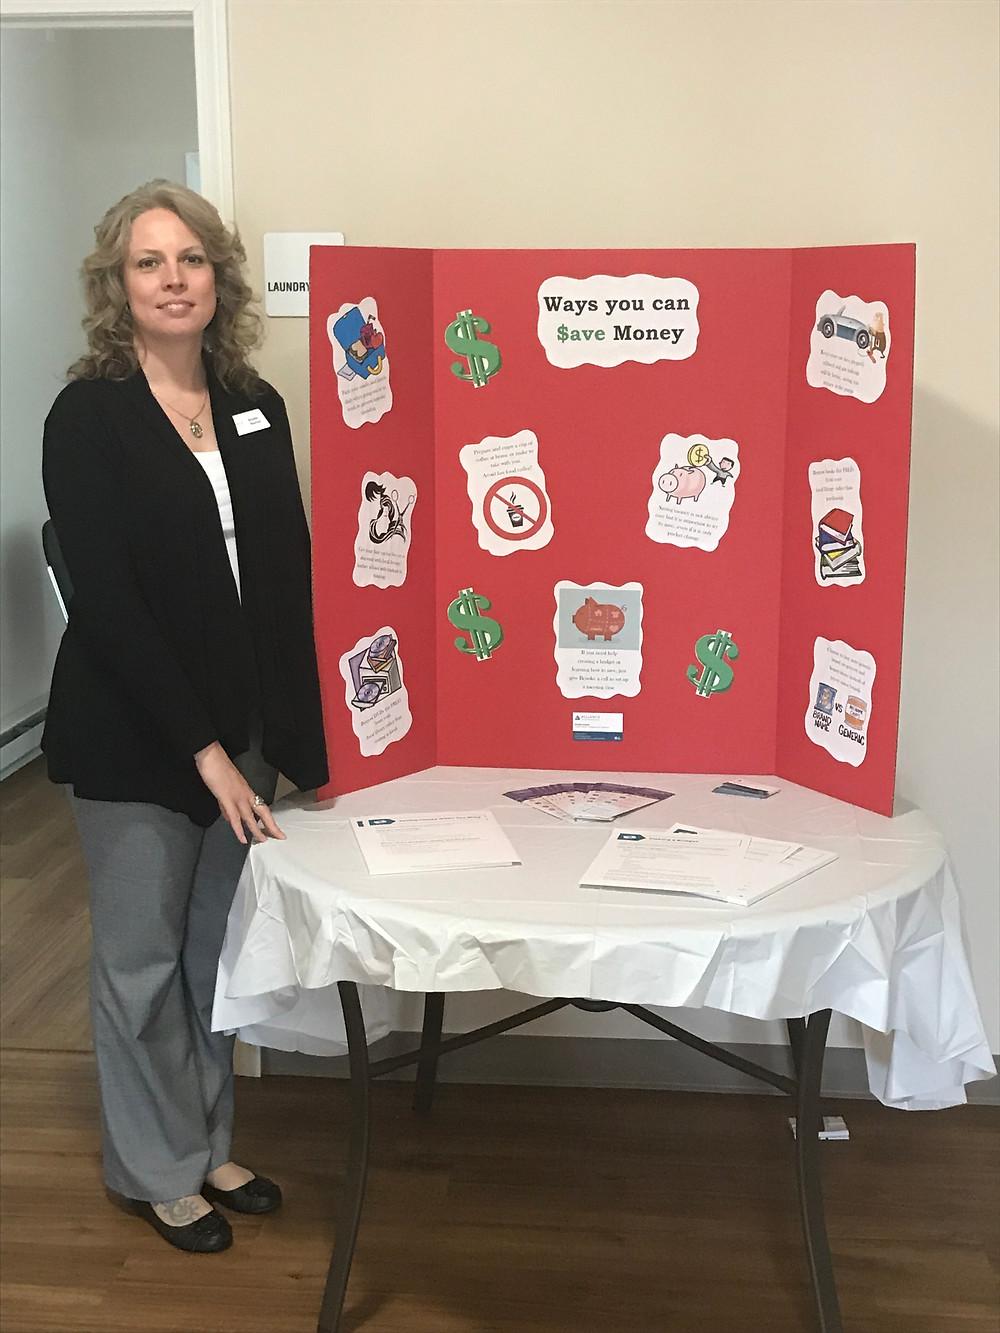 Brooke Noonan, Resident Services Coordinator